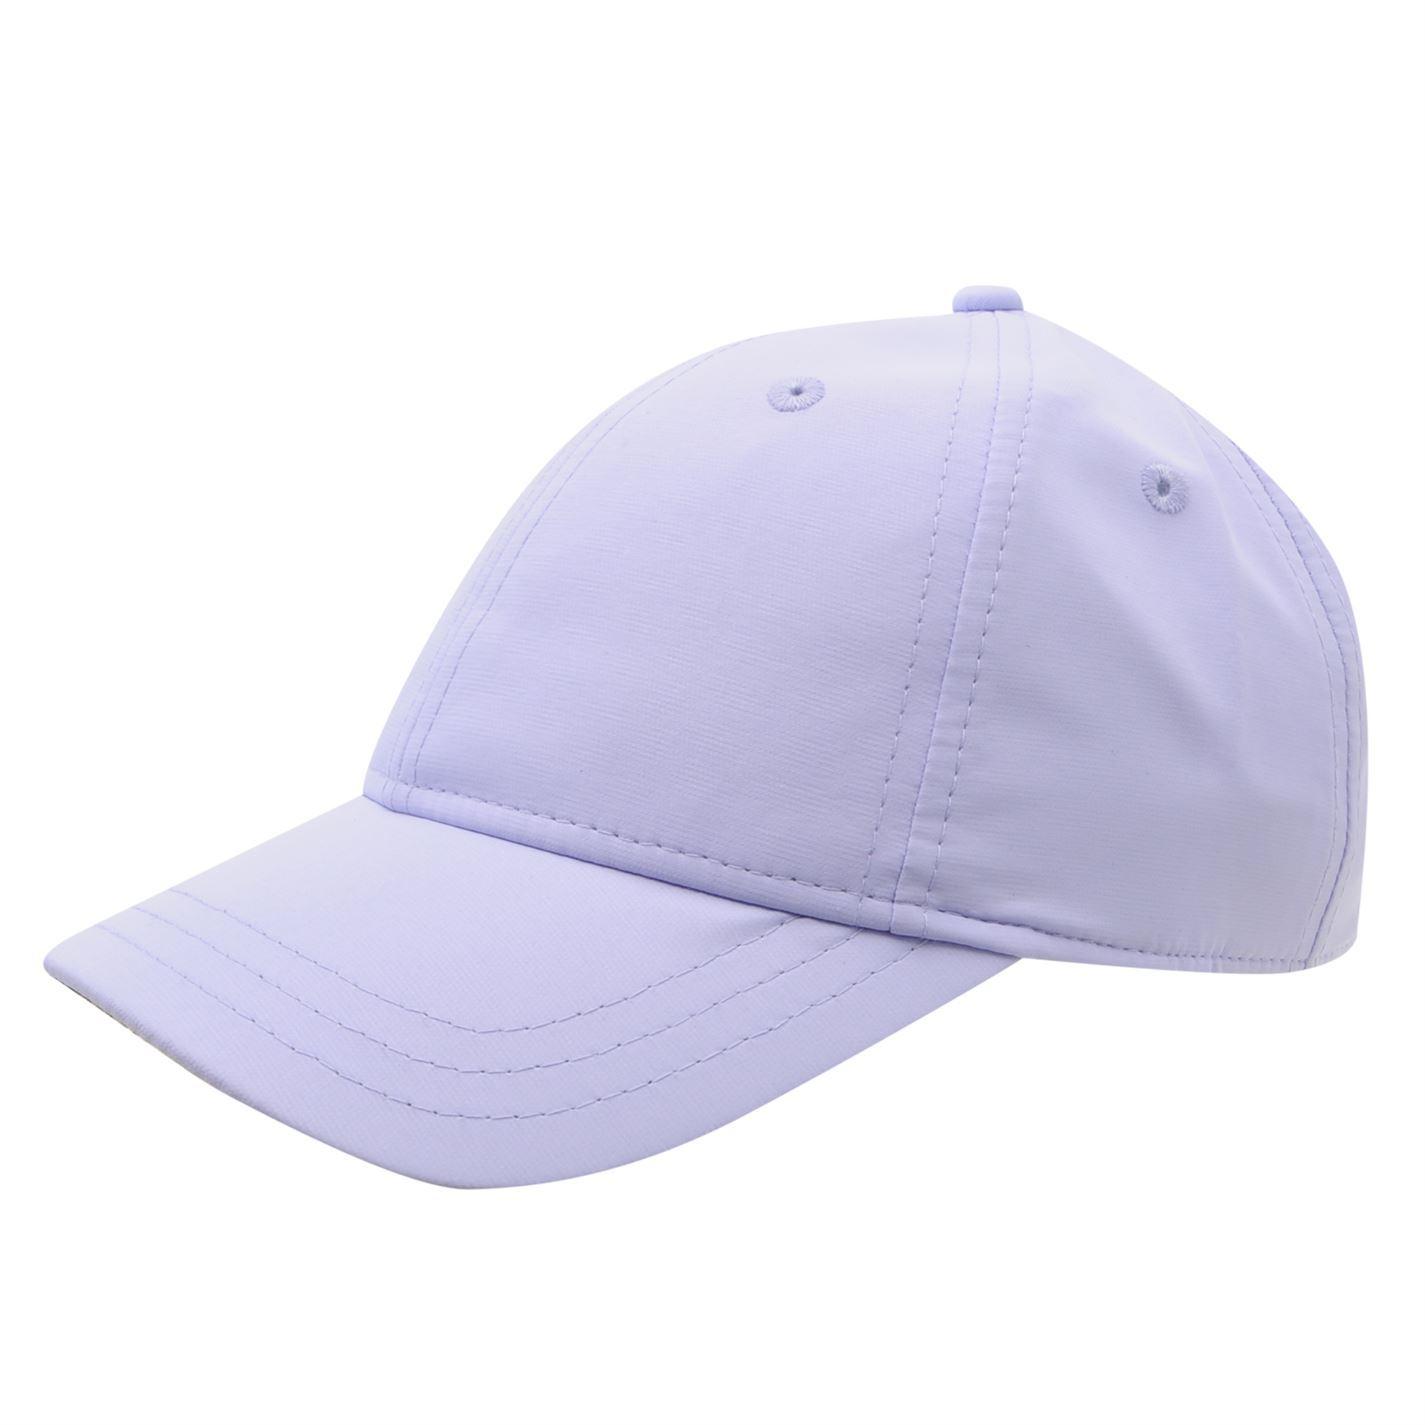 adidas crestling golf baseball cap womens avery peaked